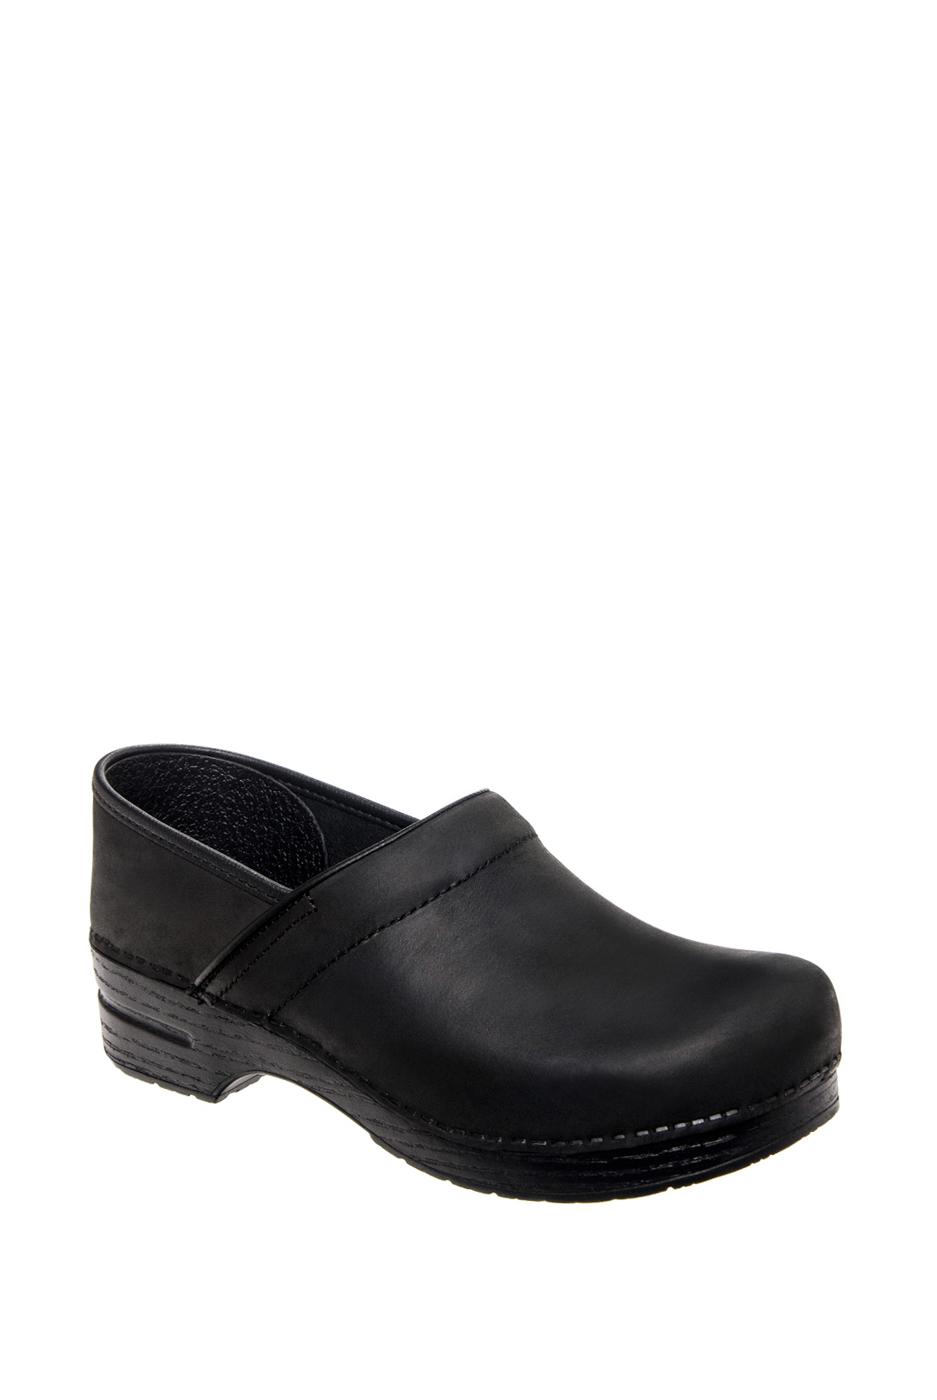 Dansko Professional Oiled Clogs - Black